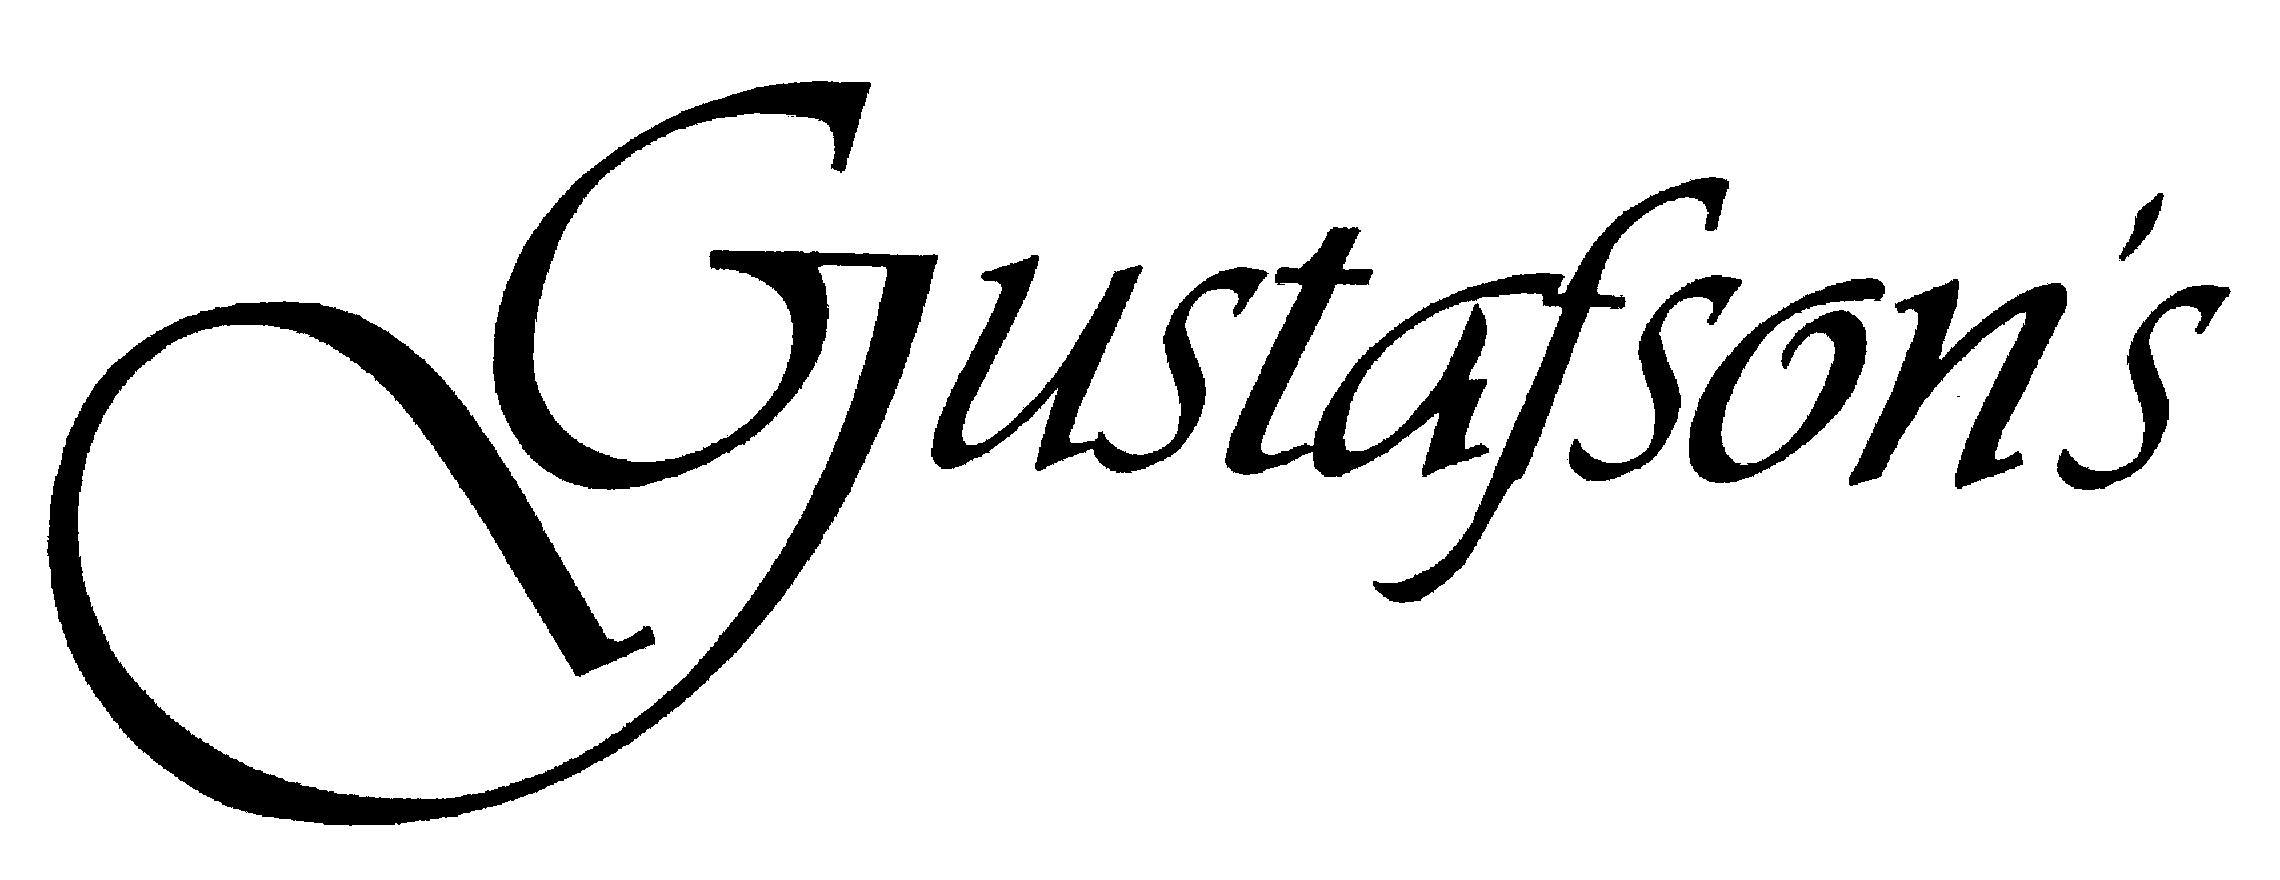 Gustafson's.jpg